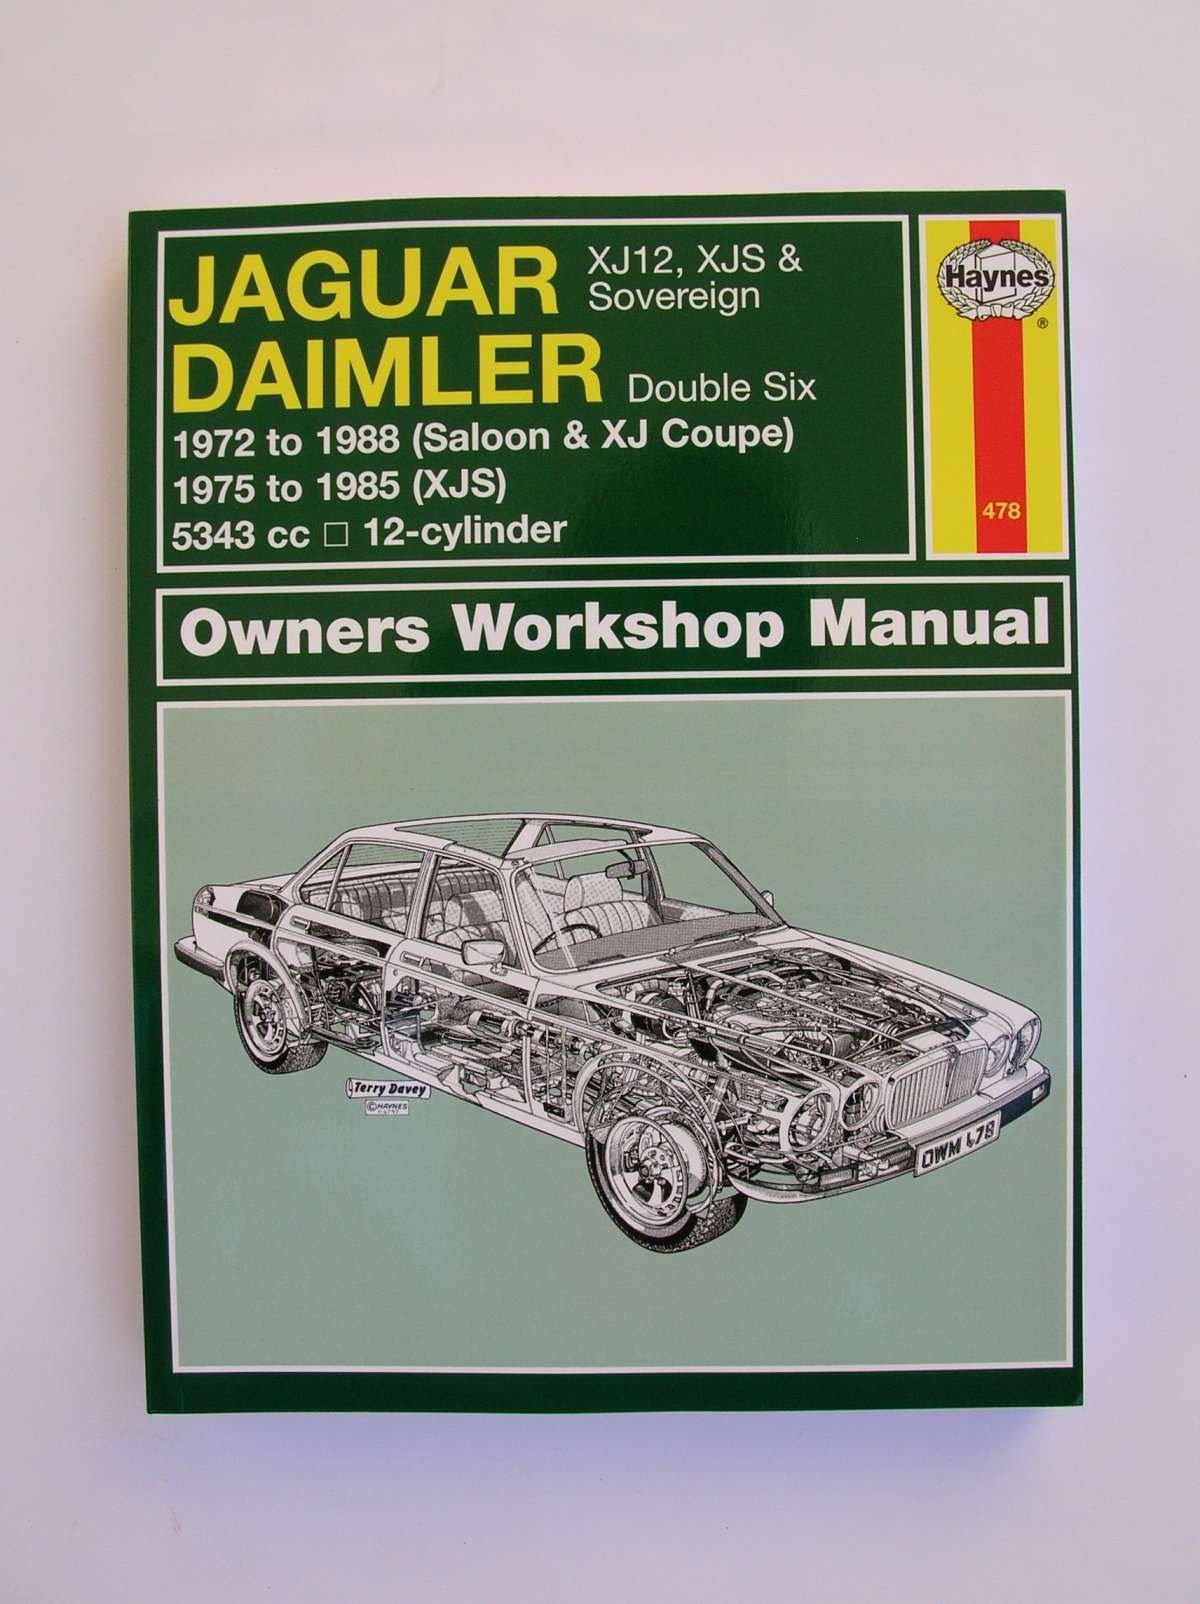 jaguar drivers club qld jaguar daimler 12 cylinder owners rh jagqld org au